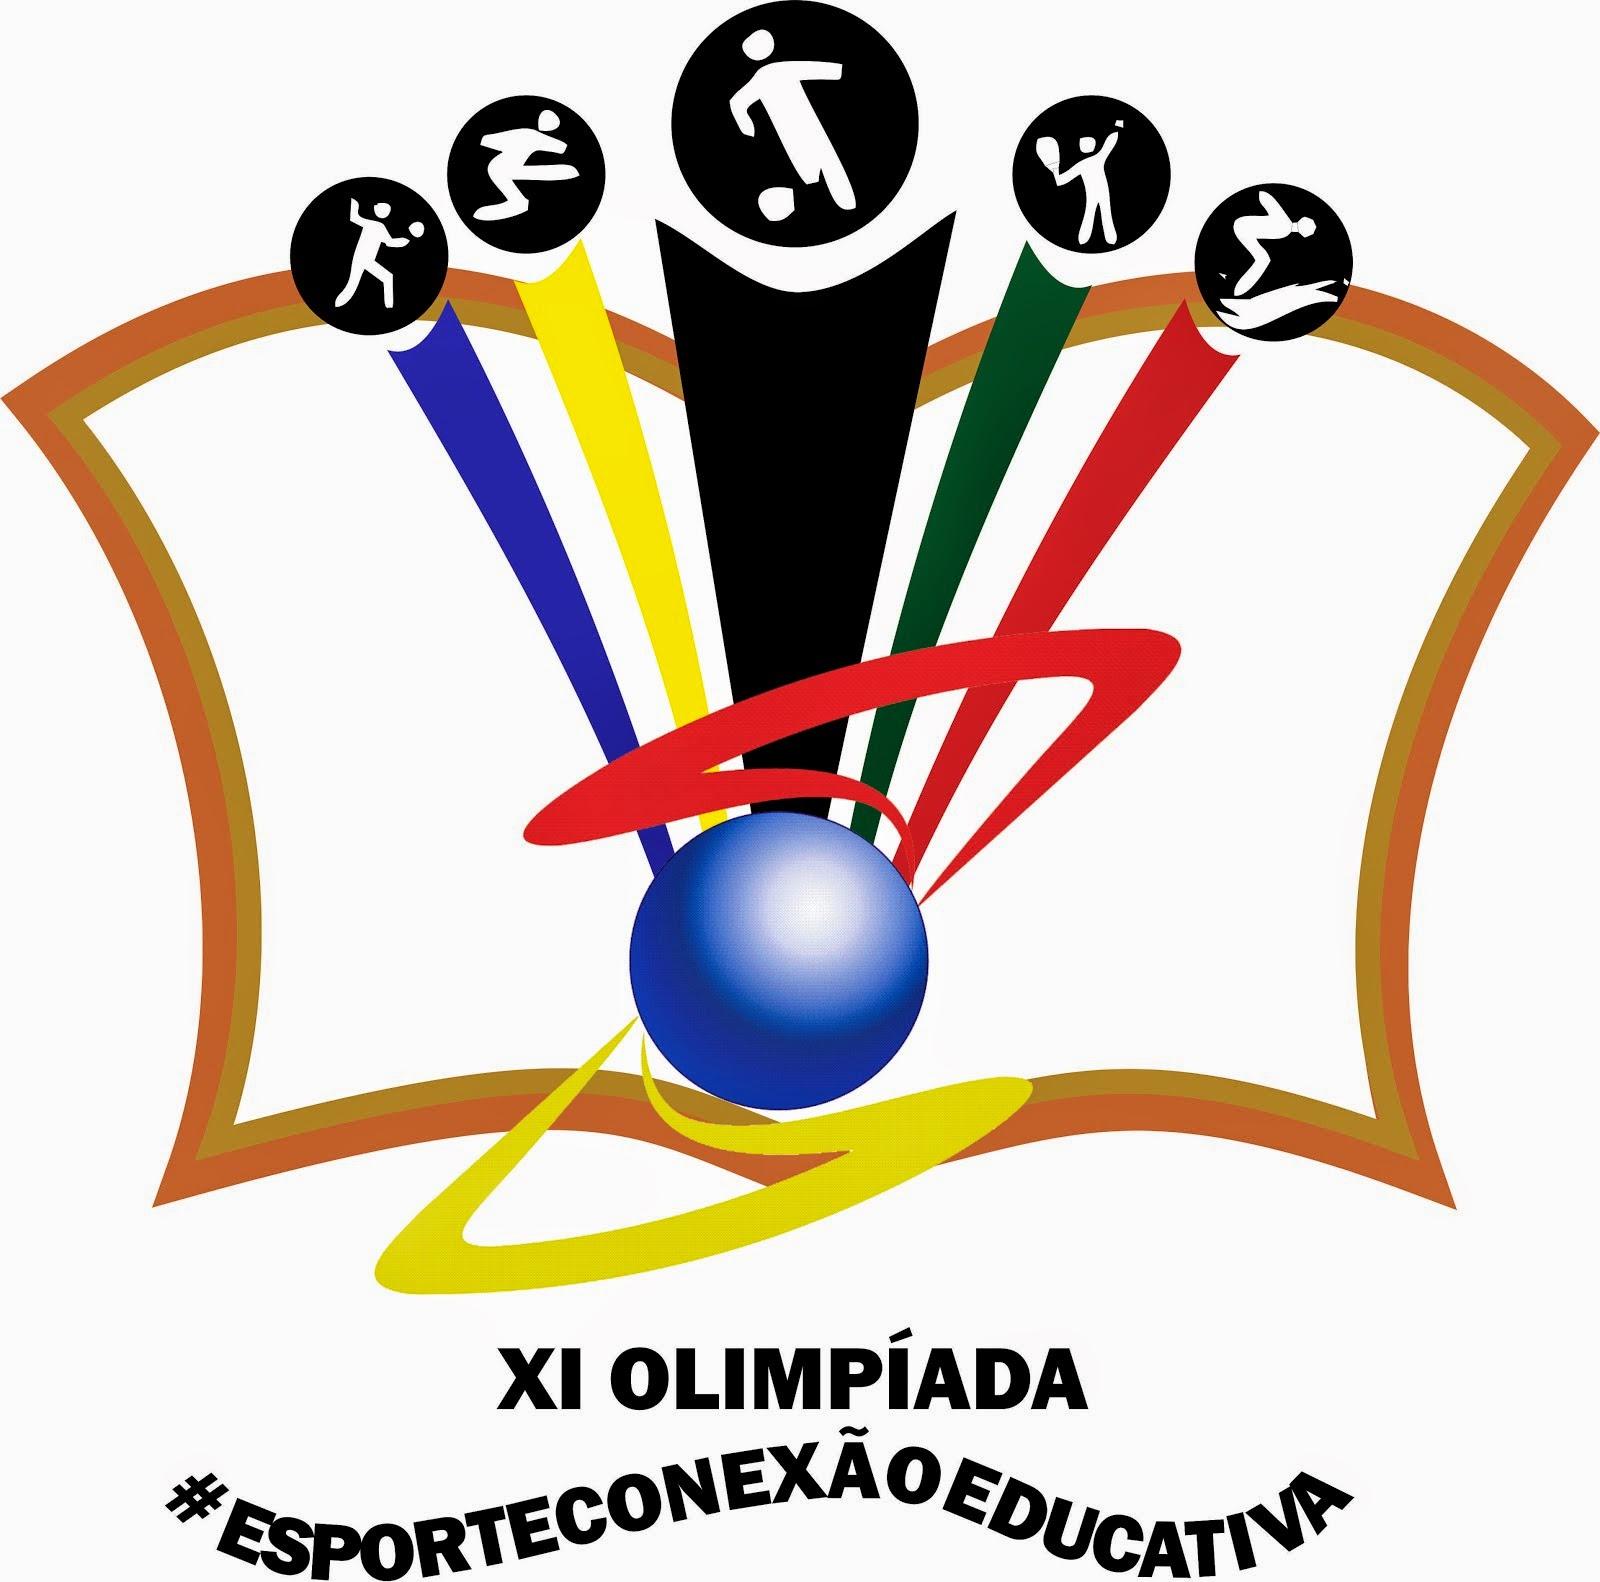 Abertura da XI Olimpíada: Dia 28/08/2014 às 10:00h